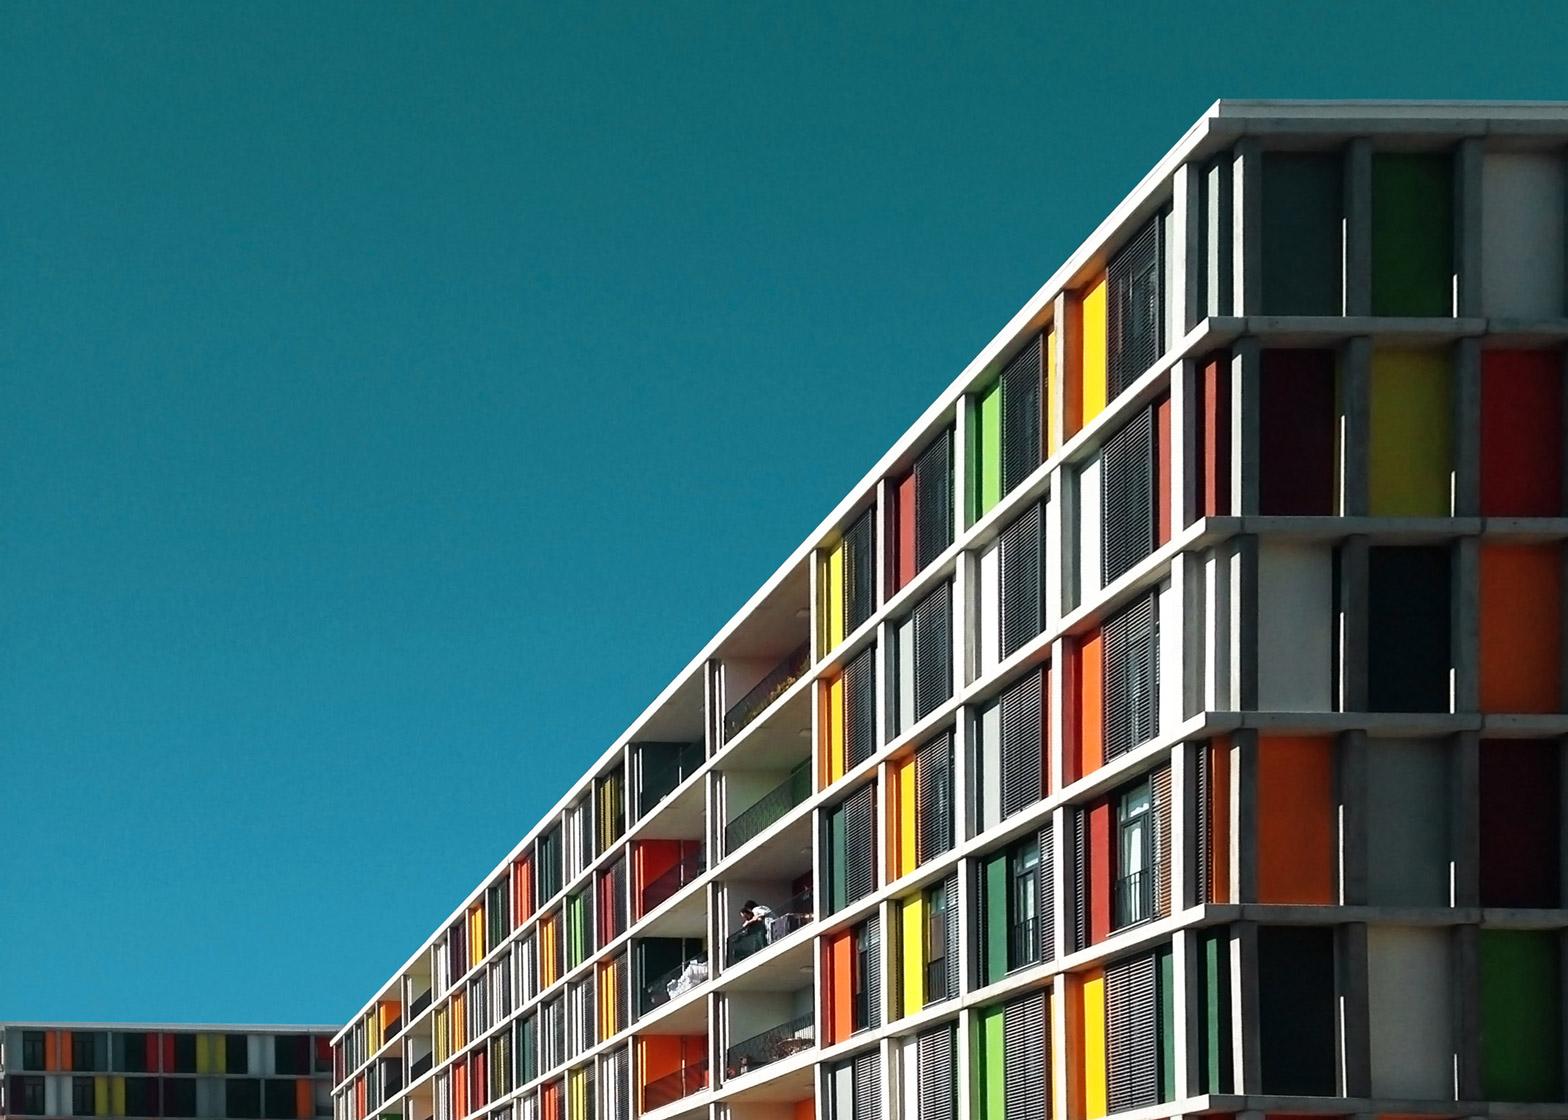 Yener Torun photograph's of vibrant modern architecture in Turkey